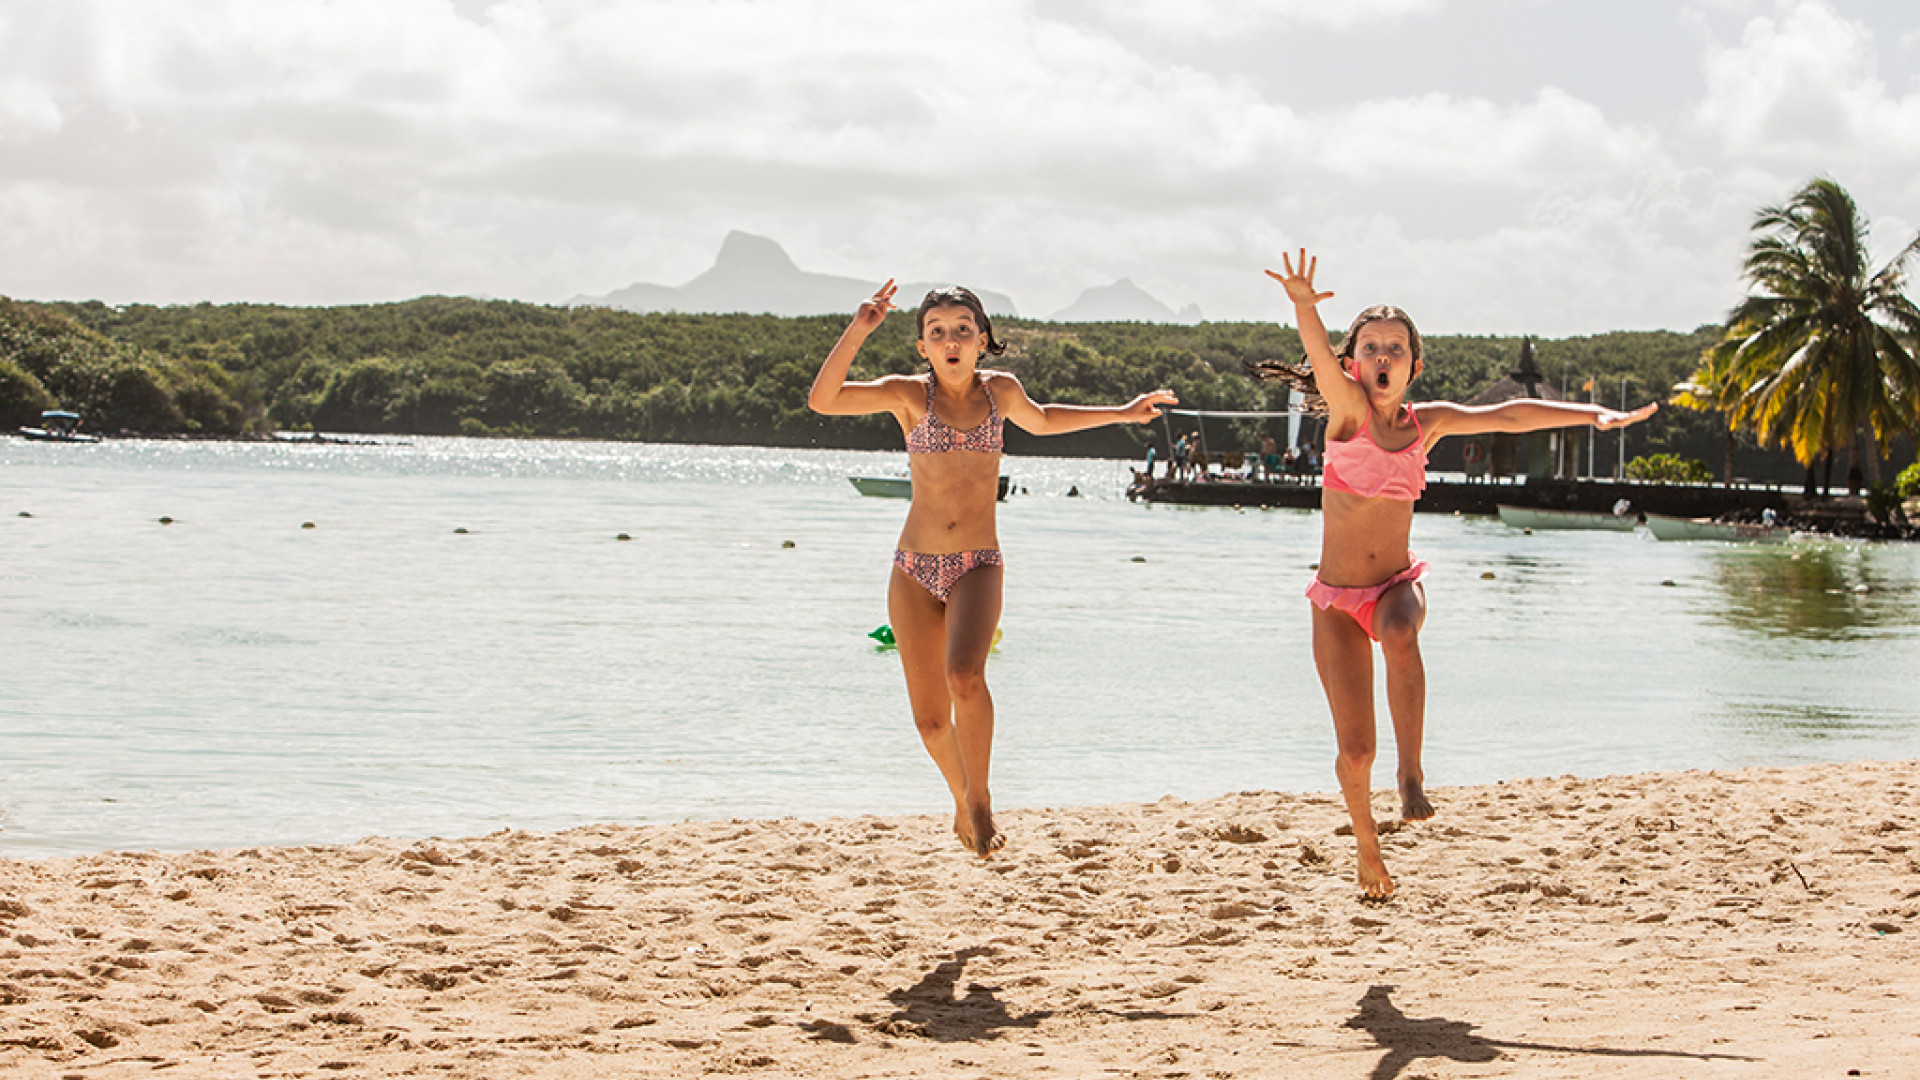 Kids on the beach at Beachcomber resorts